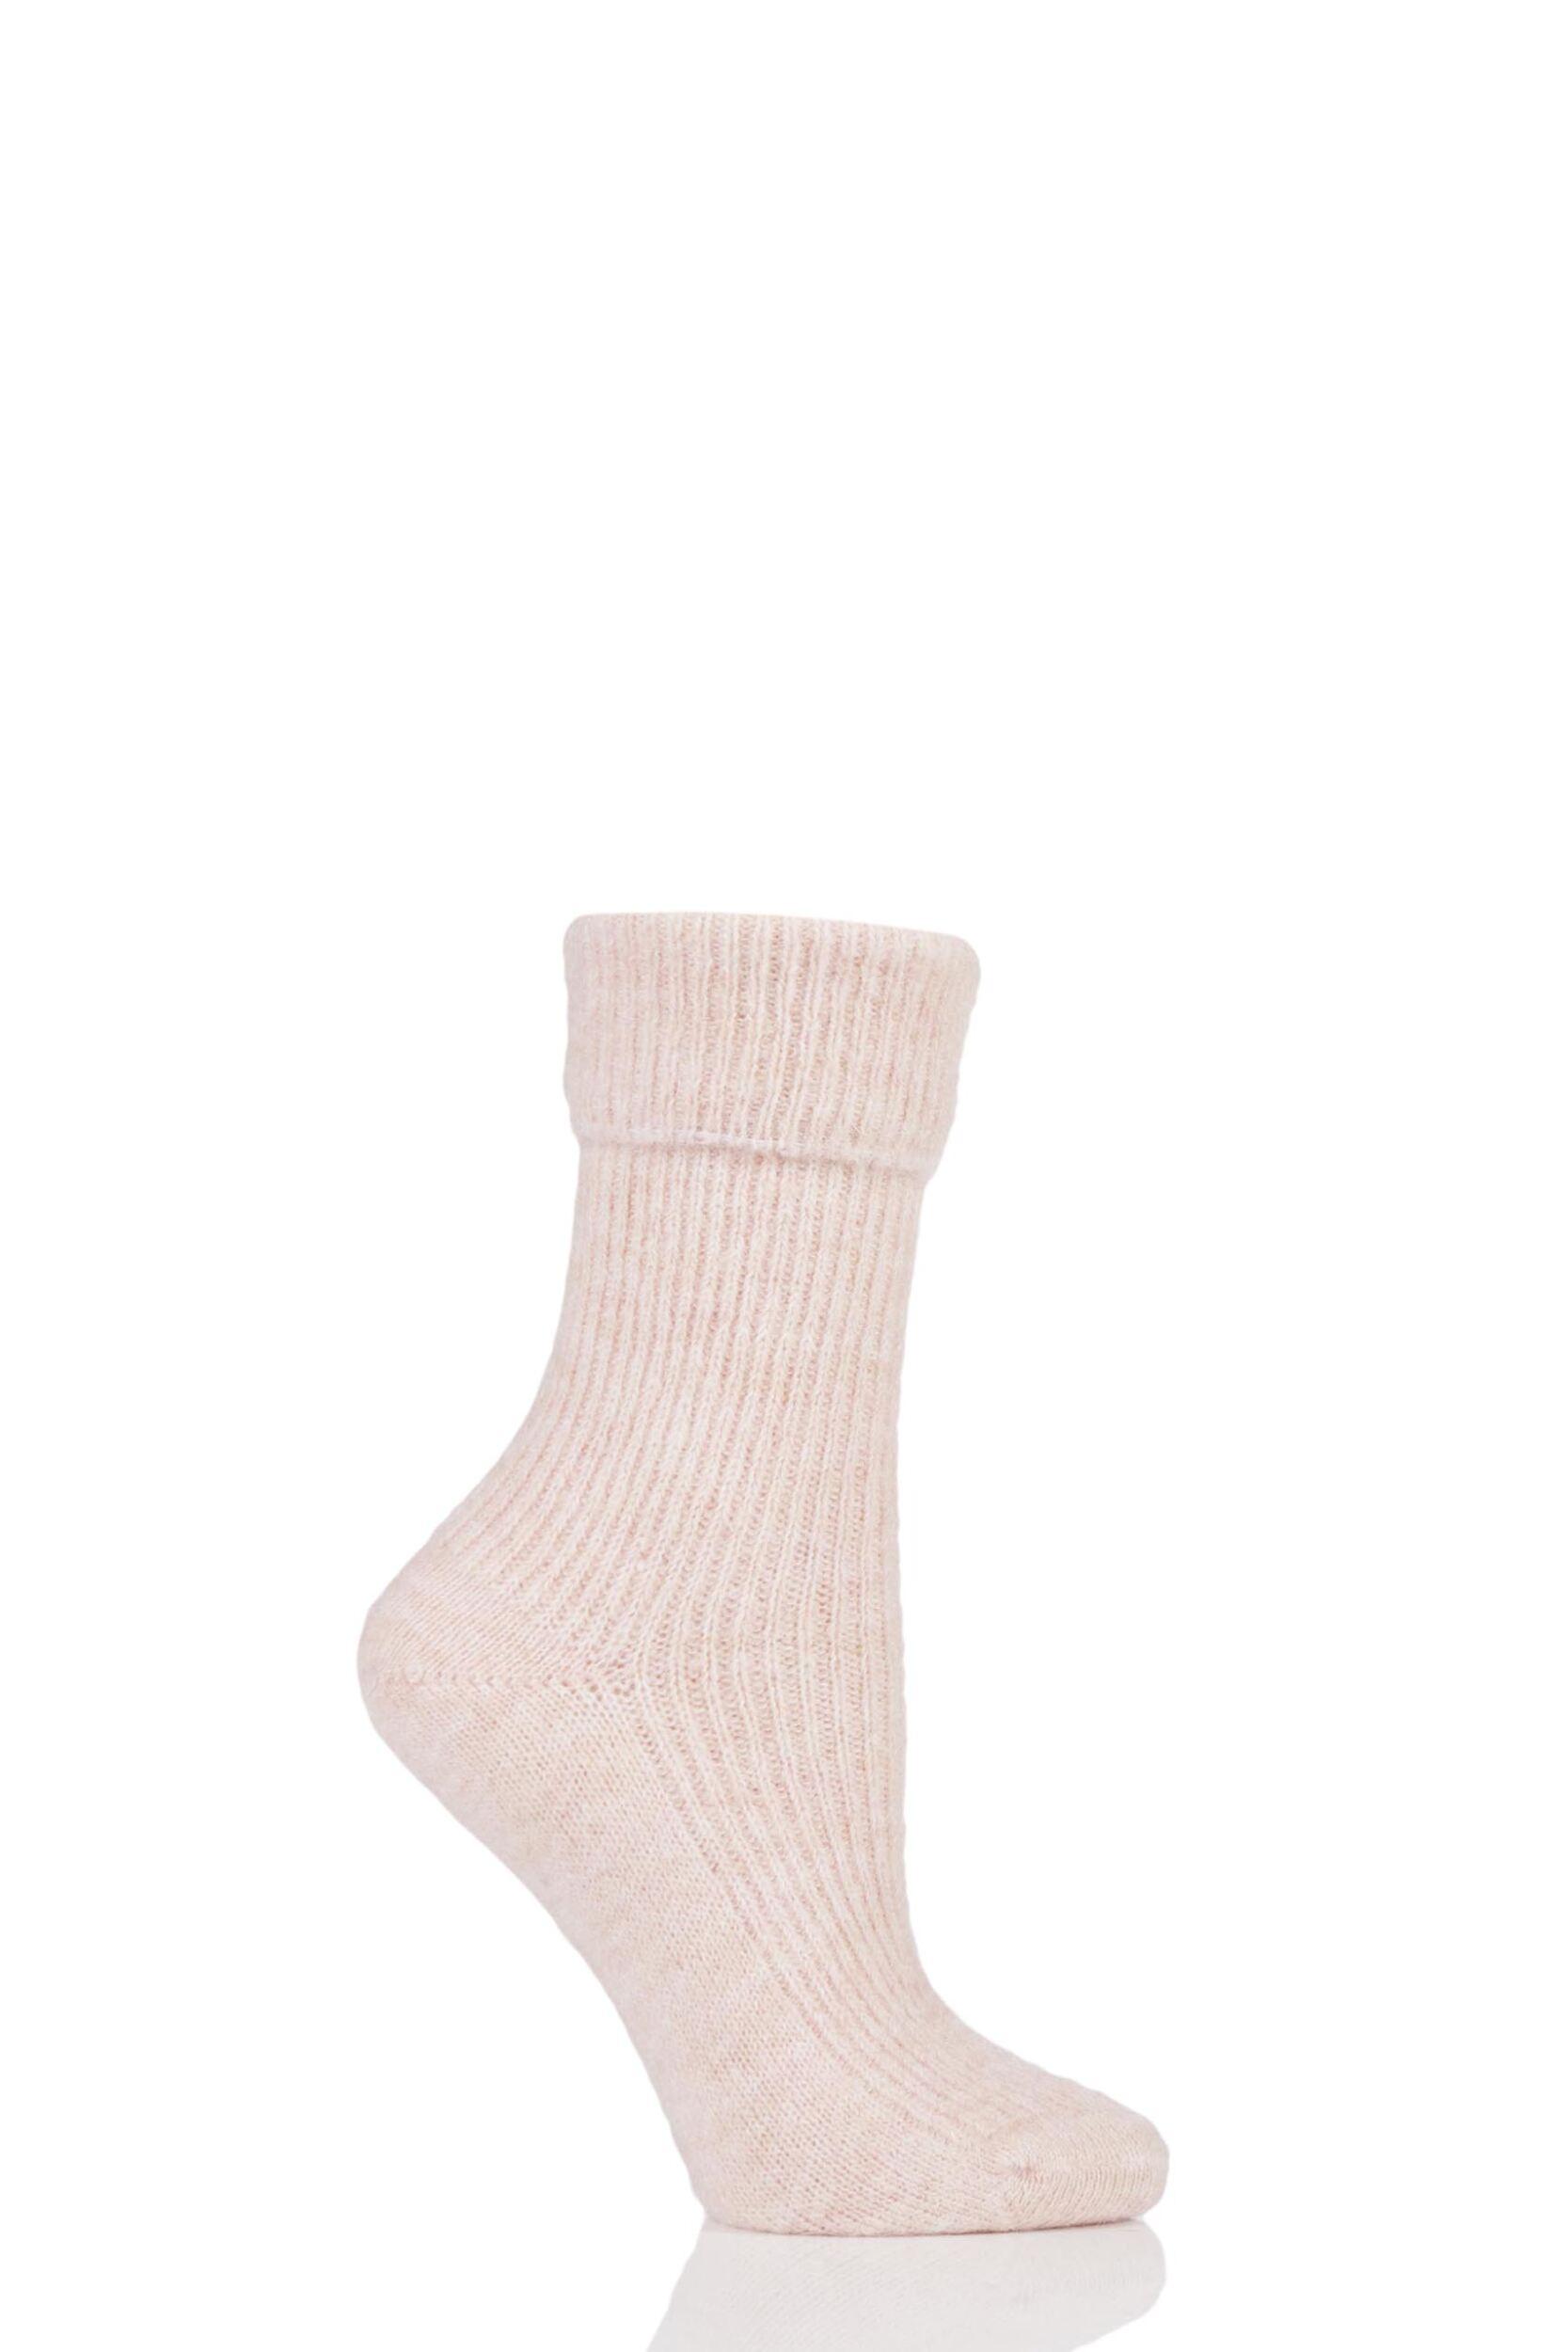 Ladies 1 Pair Urban Knit Turn Over Top Mohair and Alpaca Socks